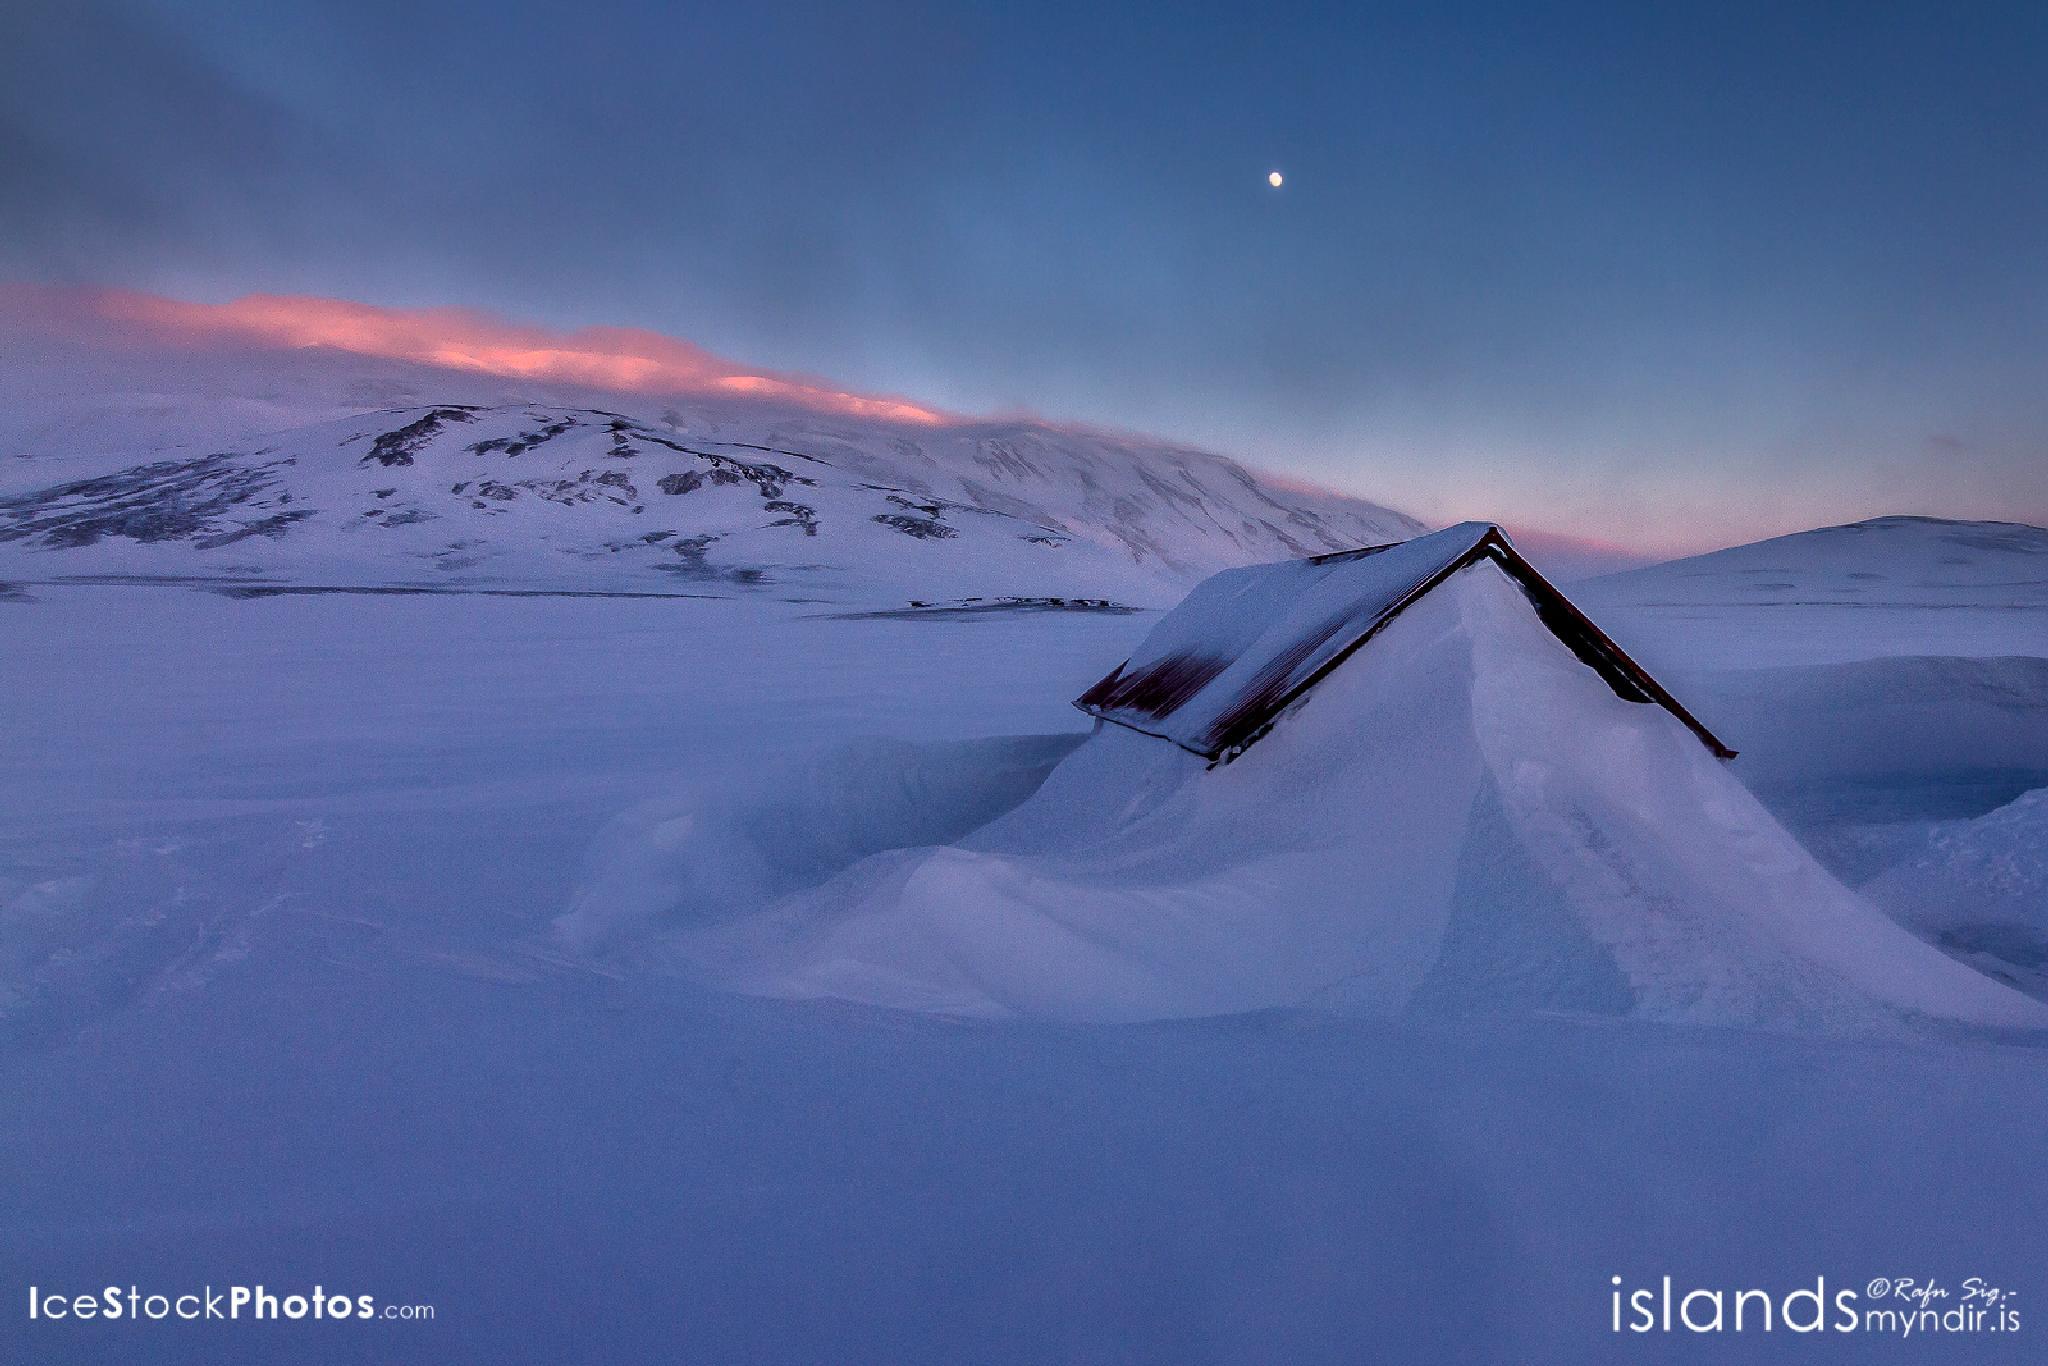 Nyidalur cabin at Sprengisandur Highland - #Iceland by Rafn Sig,-  @ Discover Wild Iceland.com